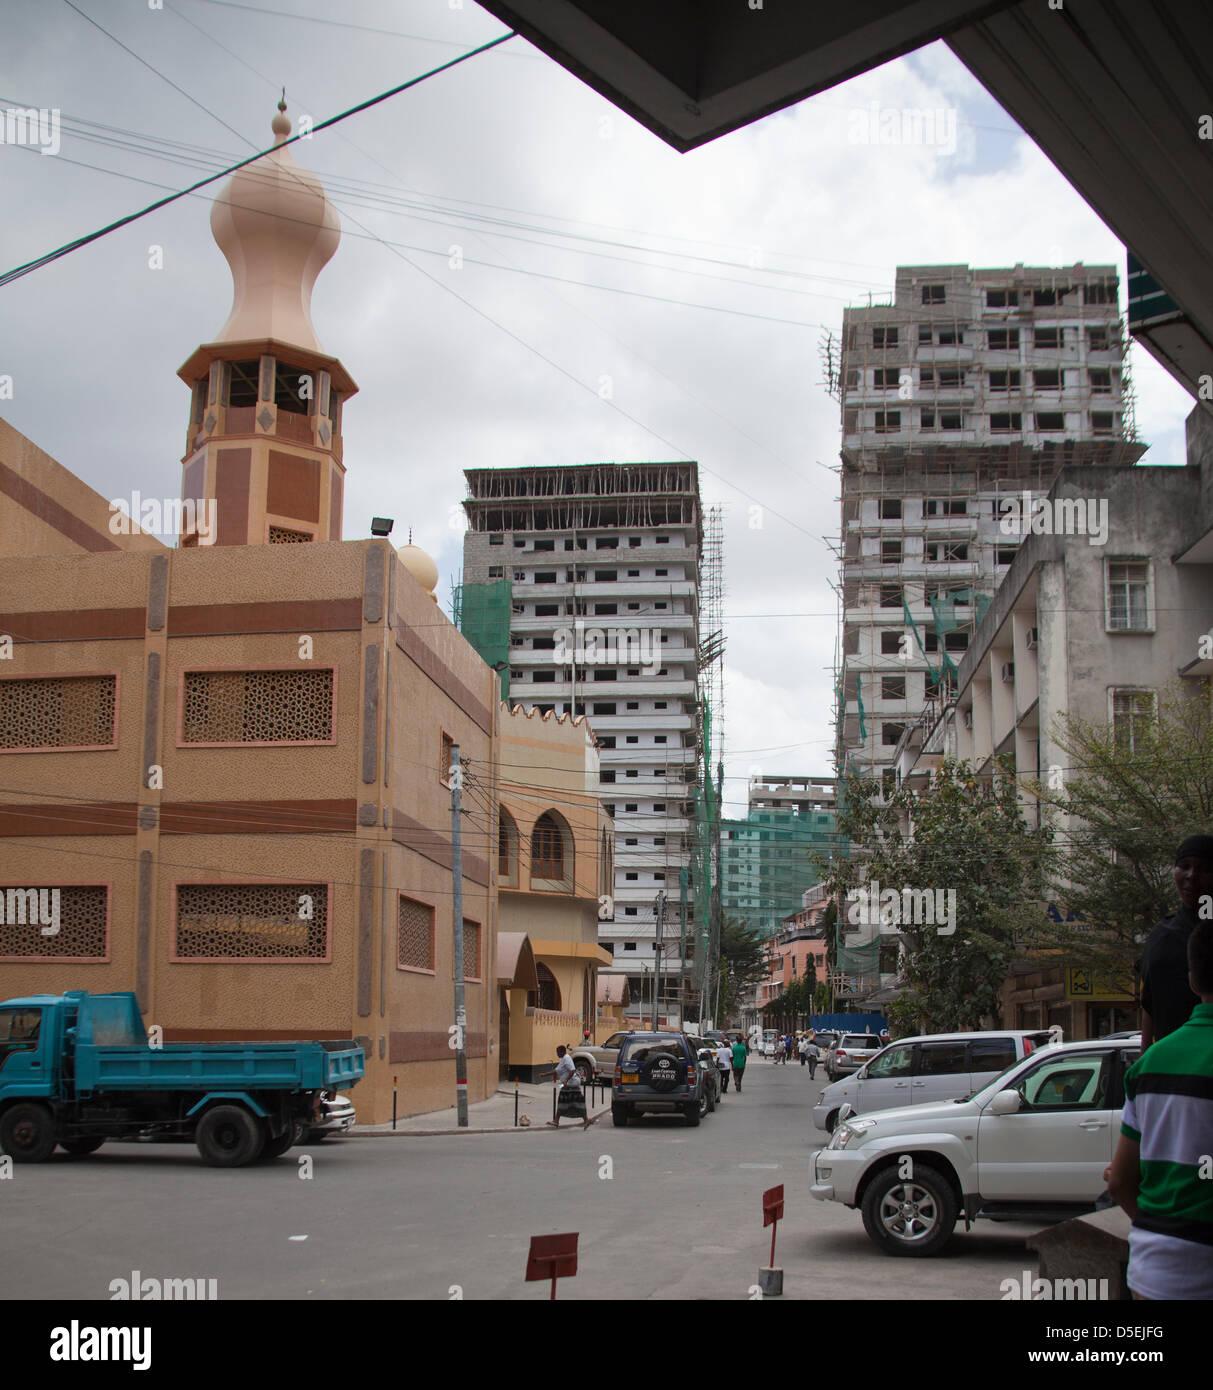 Dar es Salaam, Tanzanie. Afficher le long de la rue Indira Gandhi avec Shia Ithnasheri Mosquée sur la gauche, Photo Stock